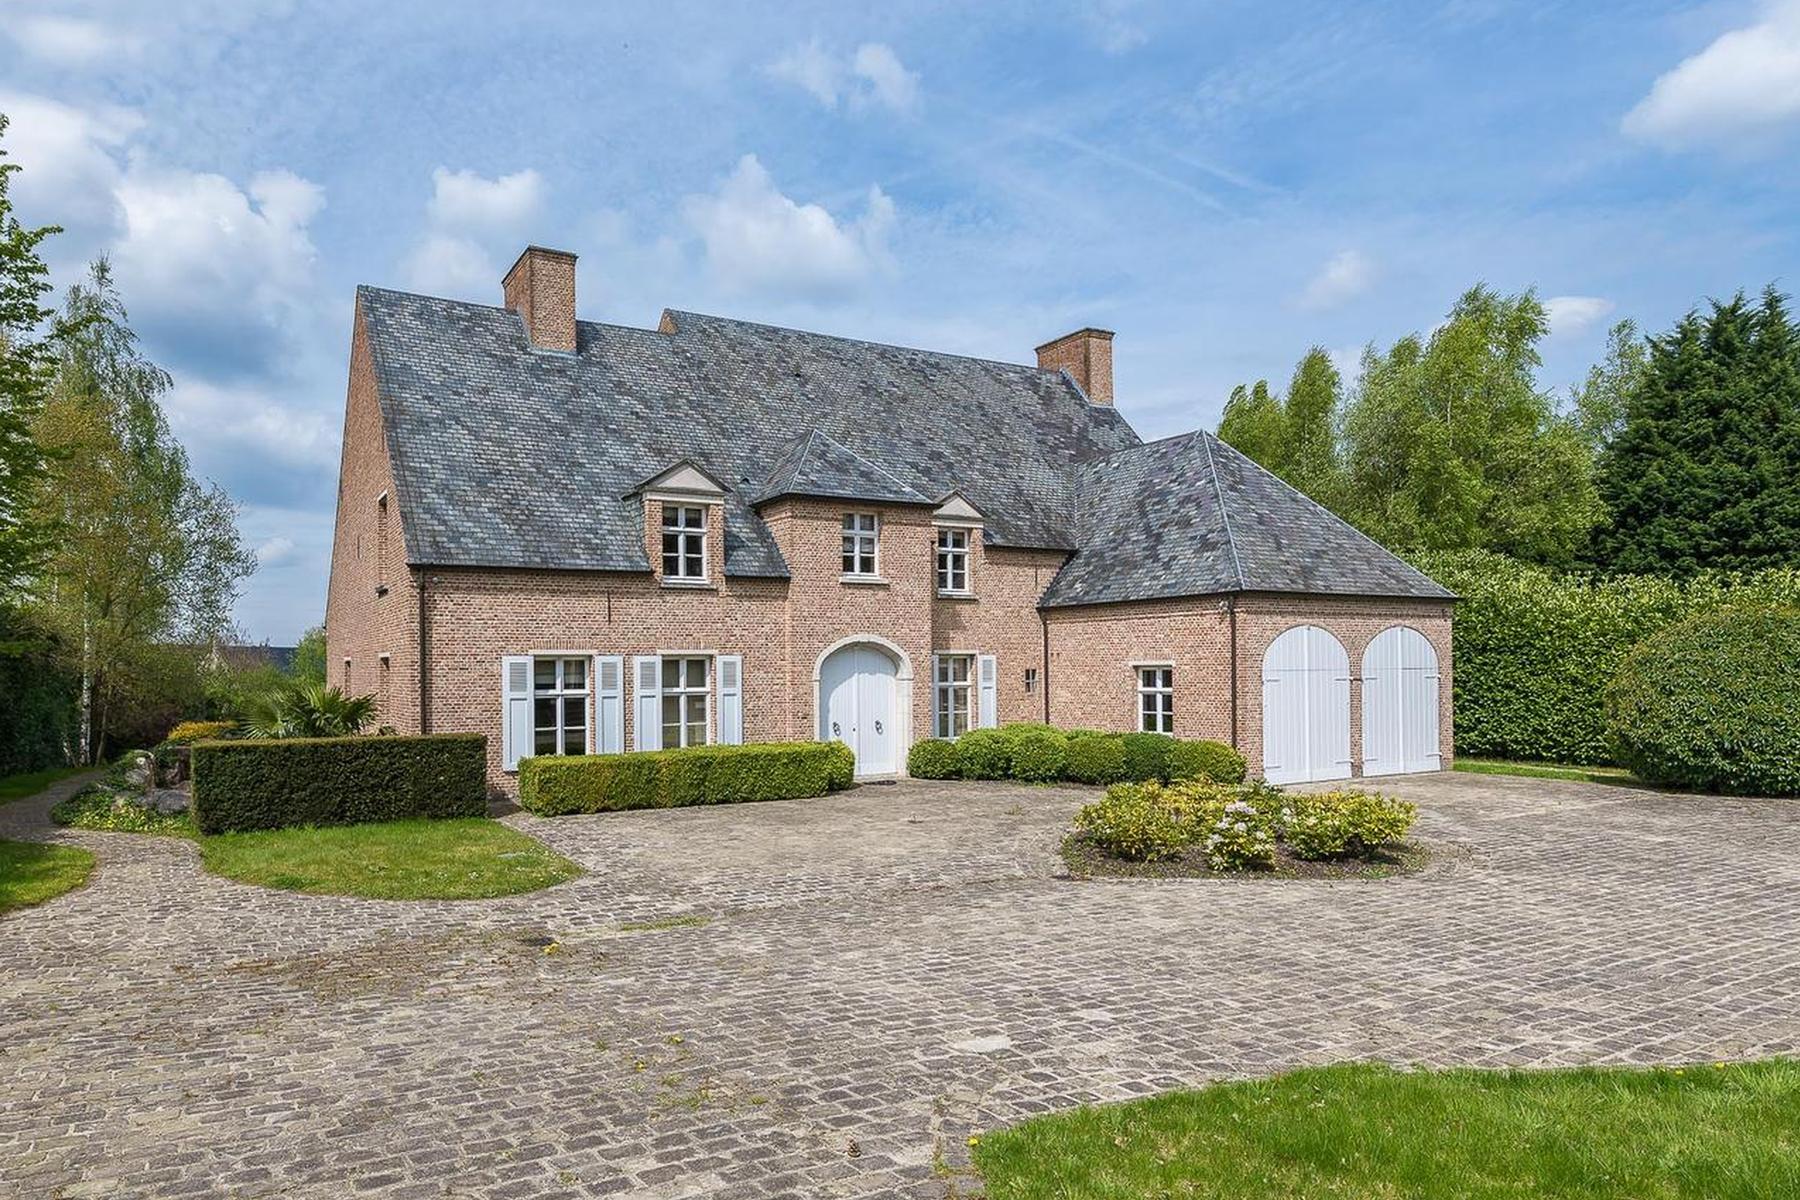 Other Residential for Sale at Rhode-Saint-Genèse I Forêt de Soignes Rhode Saint Genese, Brussels, 1640 Belgium